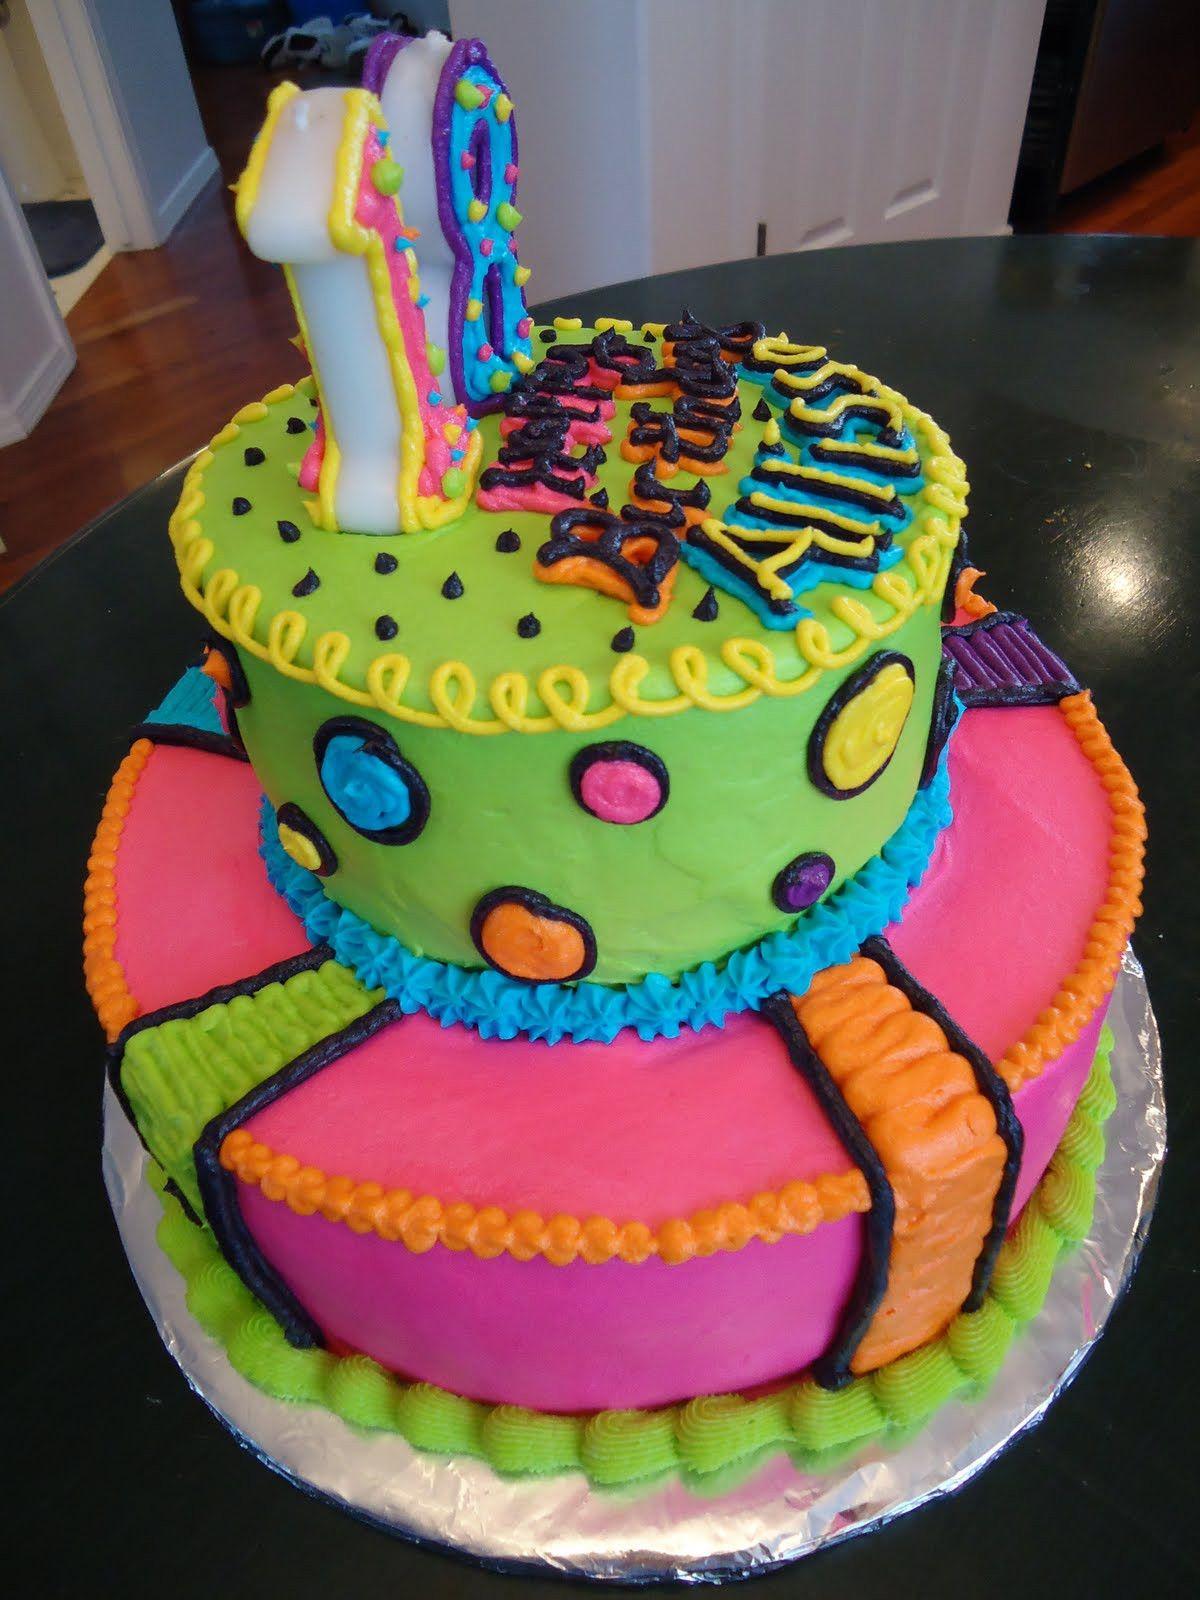 Fine Neon Lights Bright Bright Bright Top 20 Neon Birthday Cakes Birthday Cards Printable Riciscafe Filternl